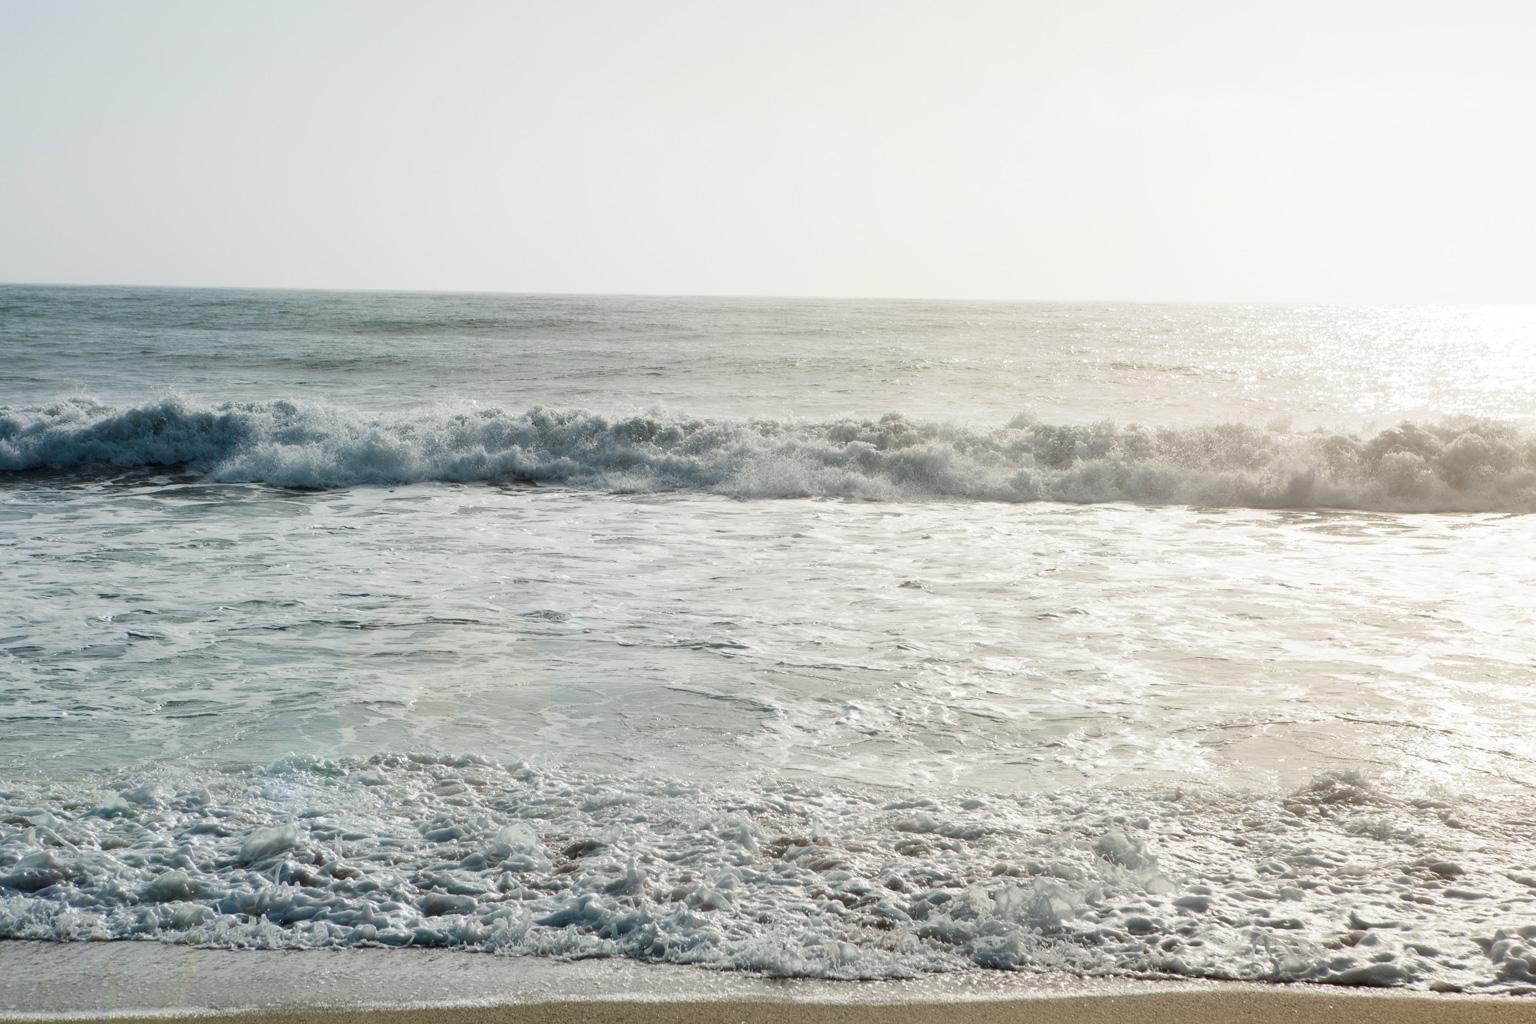 CindyGiovagnoli_SantCruz_SanJose_SanFrancisco_NelderGrove_sea_lions_boardwalk_hapas_brewery_sourdough_ocean_half_moon_bay_California-079.jpg